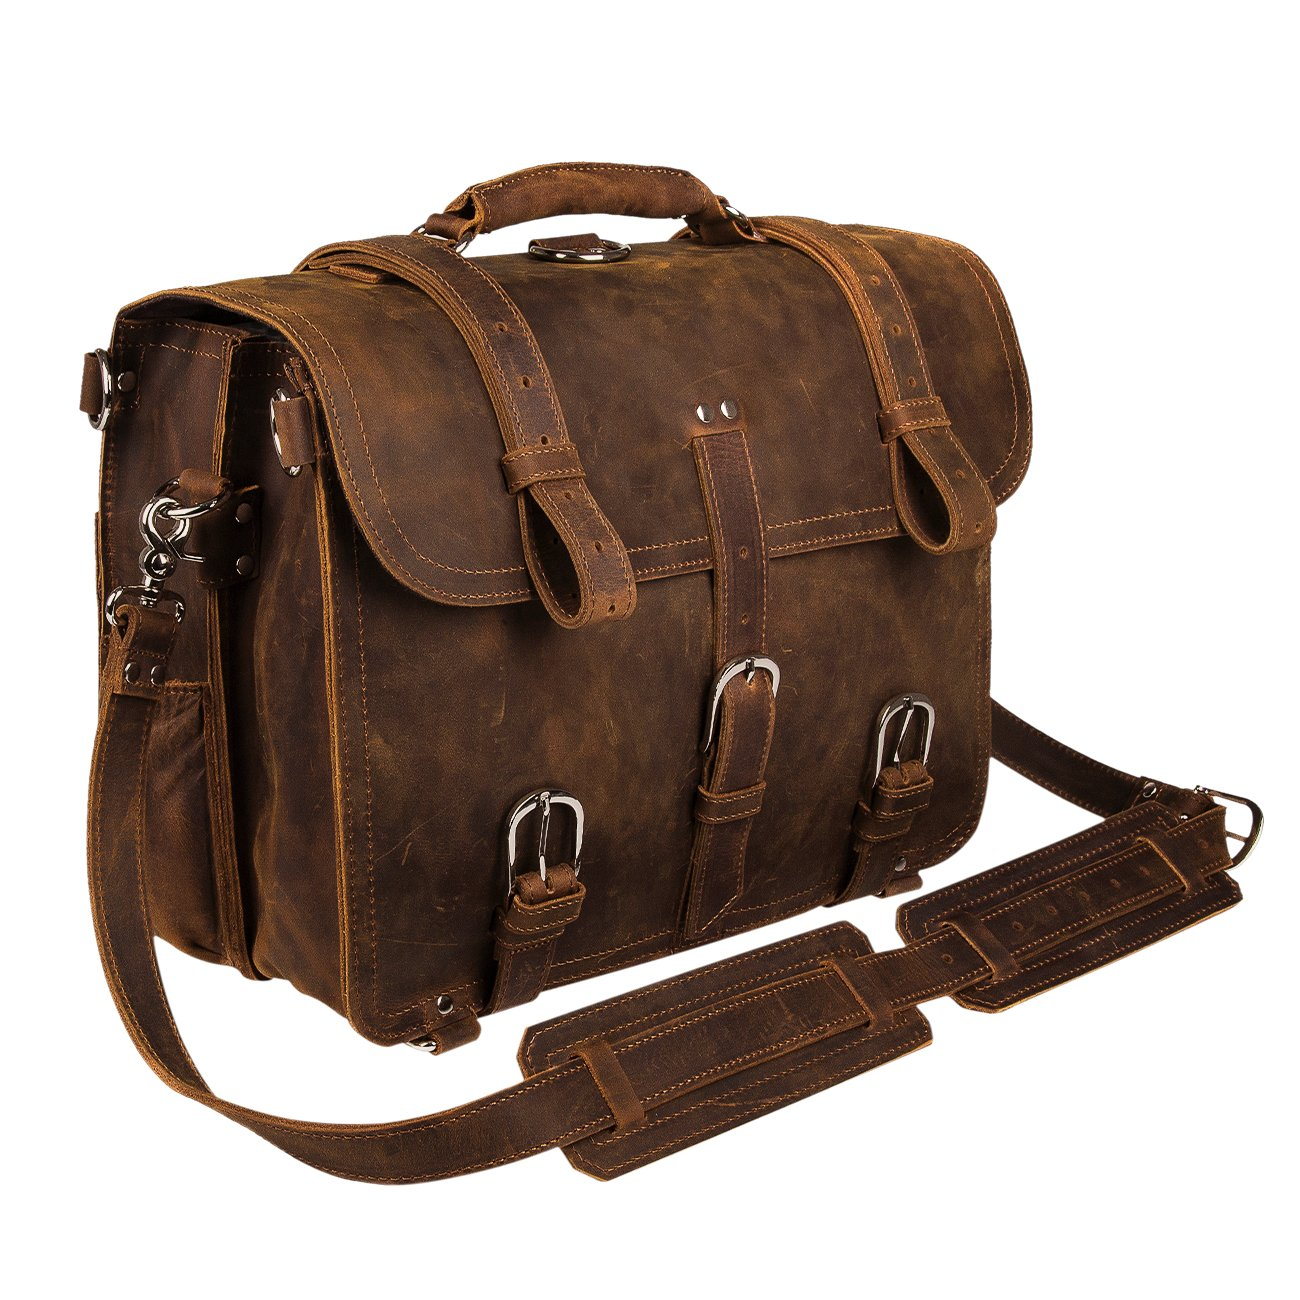 Augus Leather Messenger Bag for Men Briefcase Travel Backpack Shoulder Bag Fit 17'' Laptop by Augus